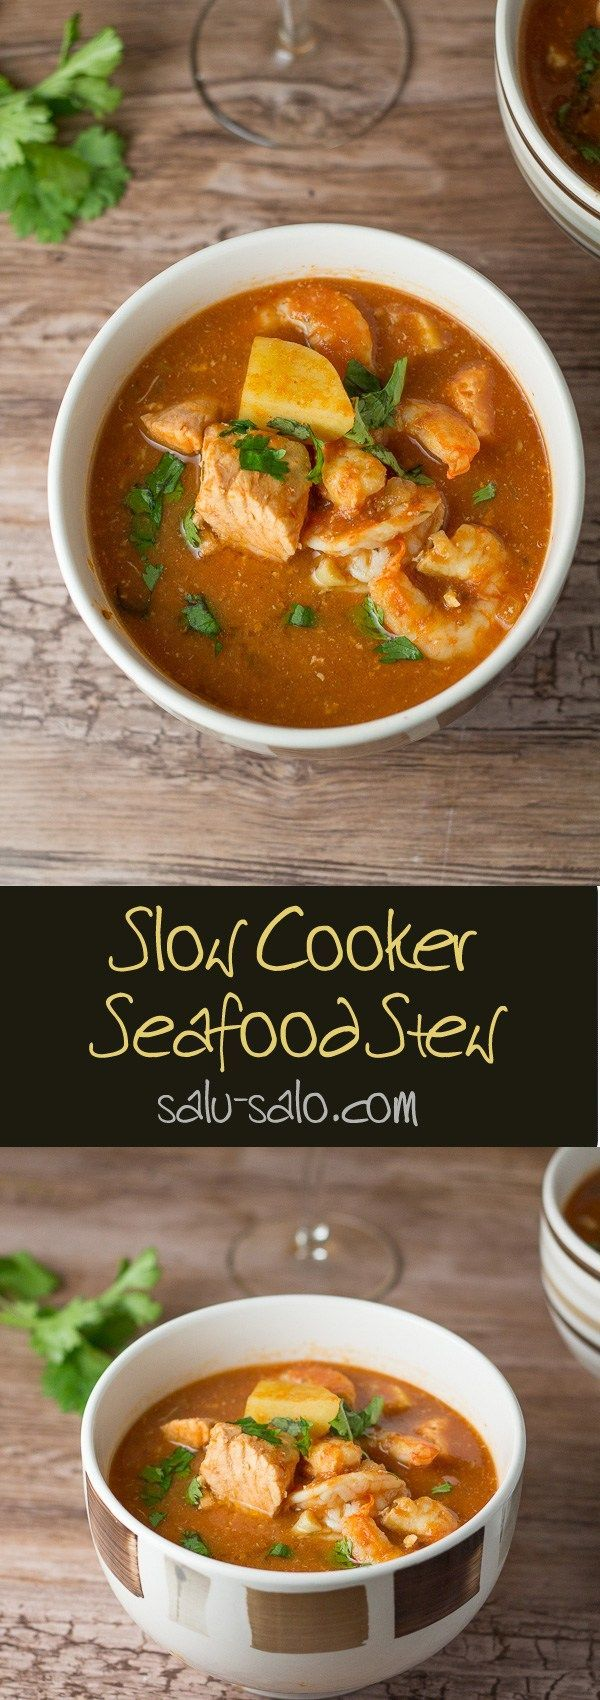 Slow Cooker Seafood Stew - Salu Salo Recipes